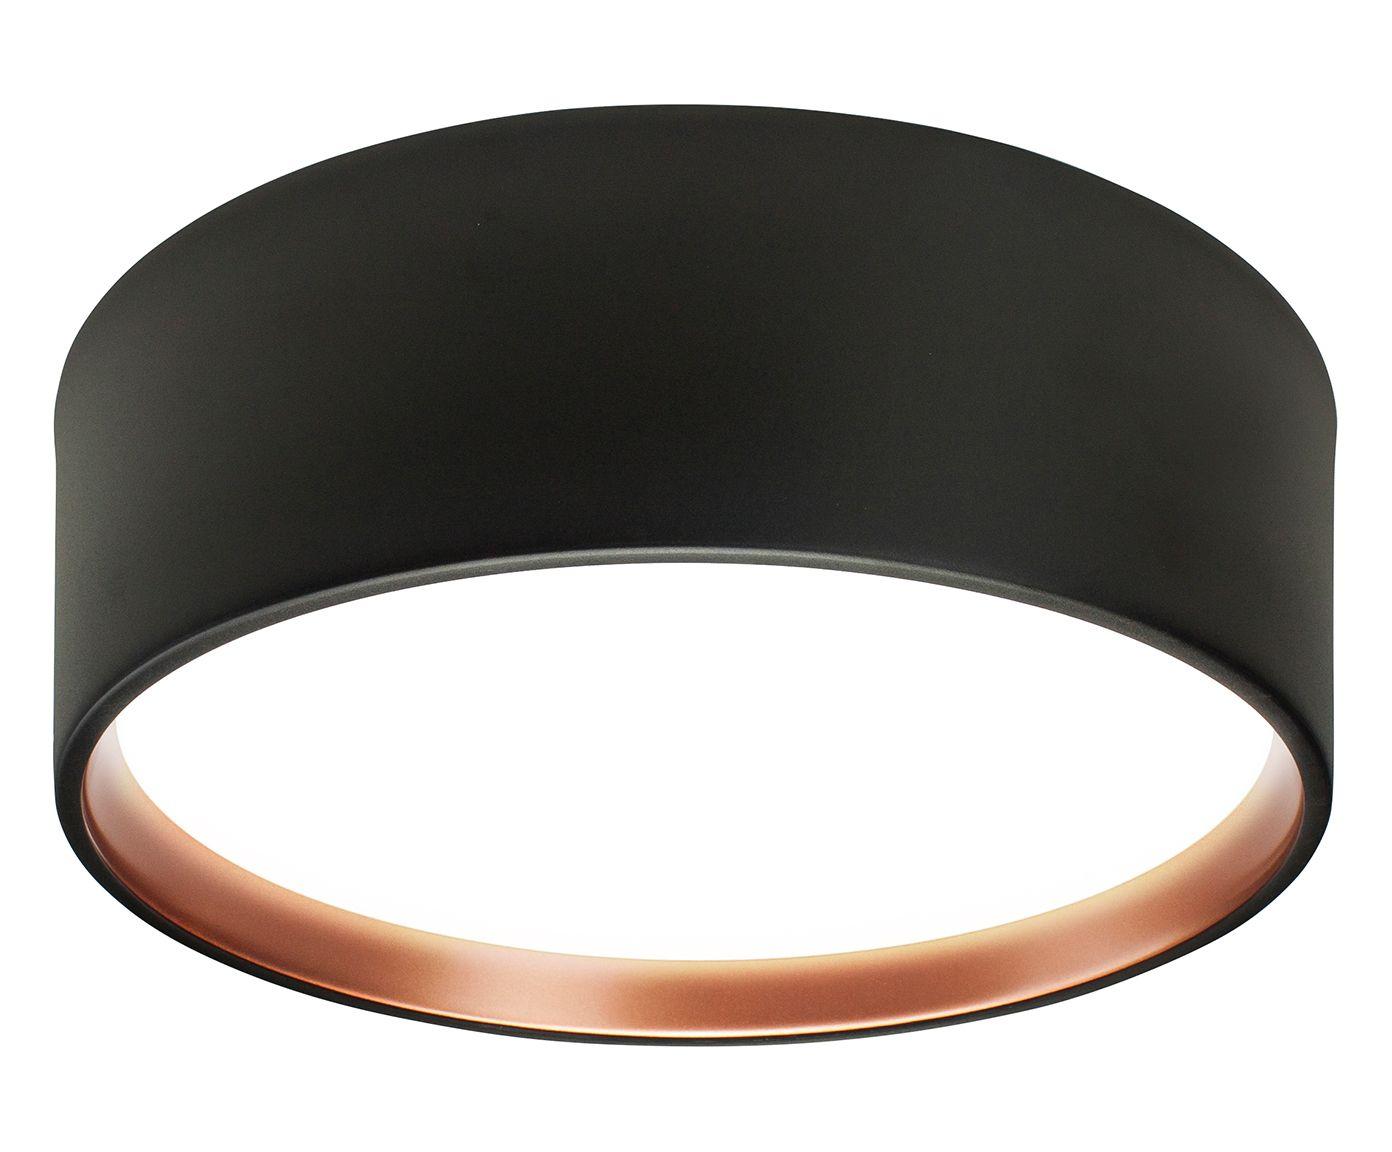 Plafon Circle Bivolt - 14,5X37cm | Westwing.com.br